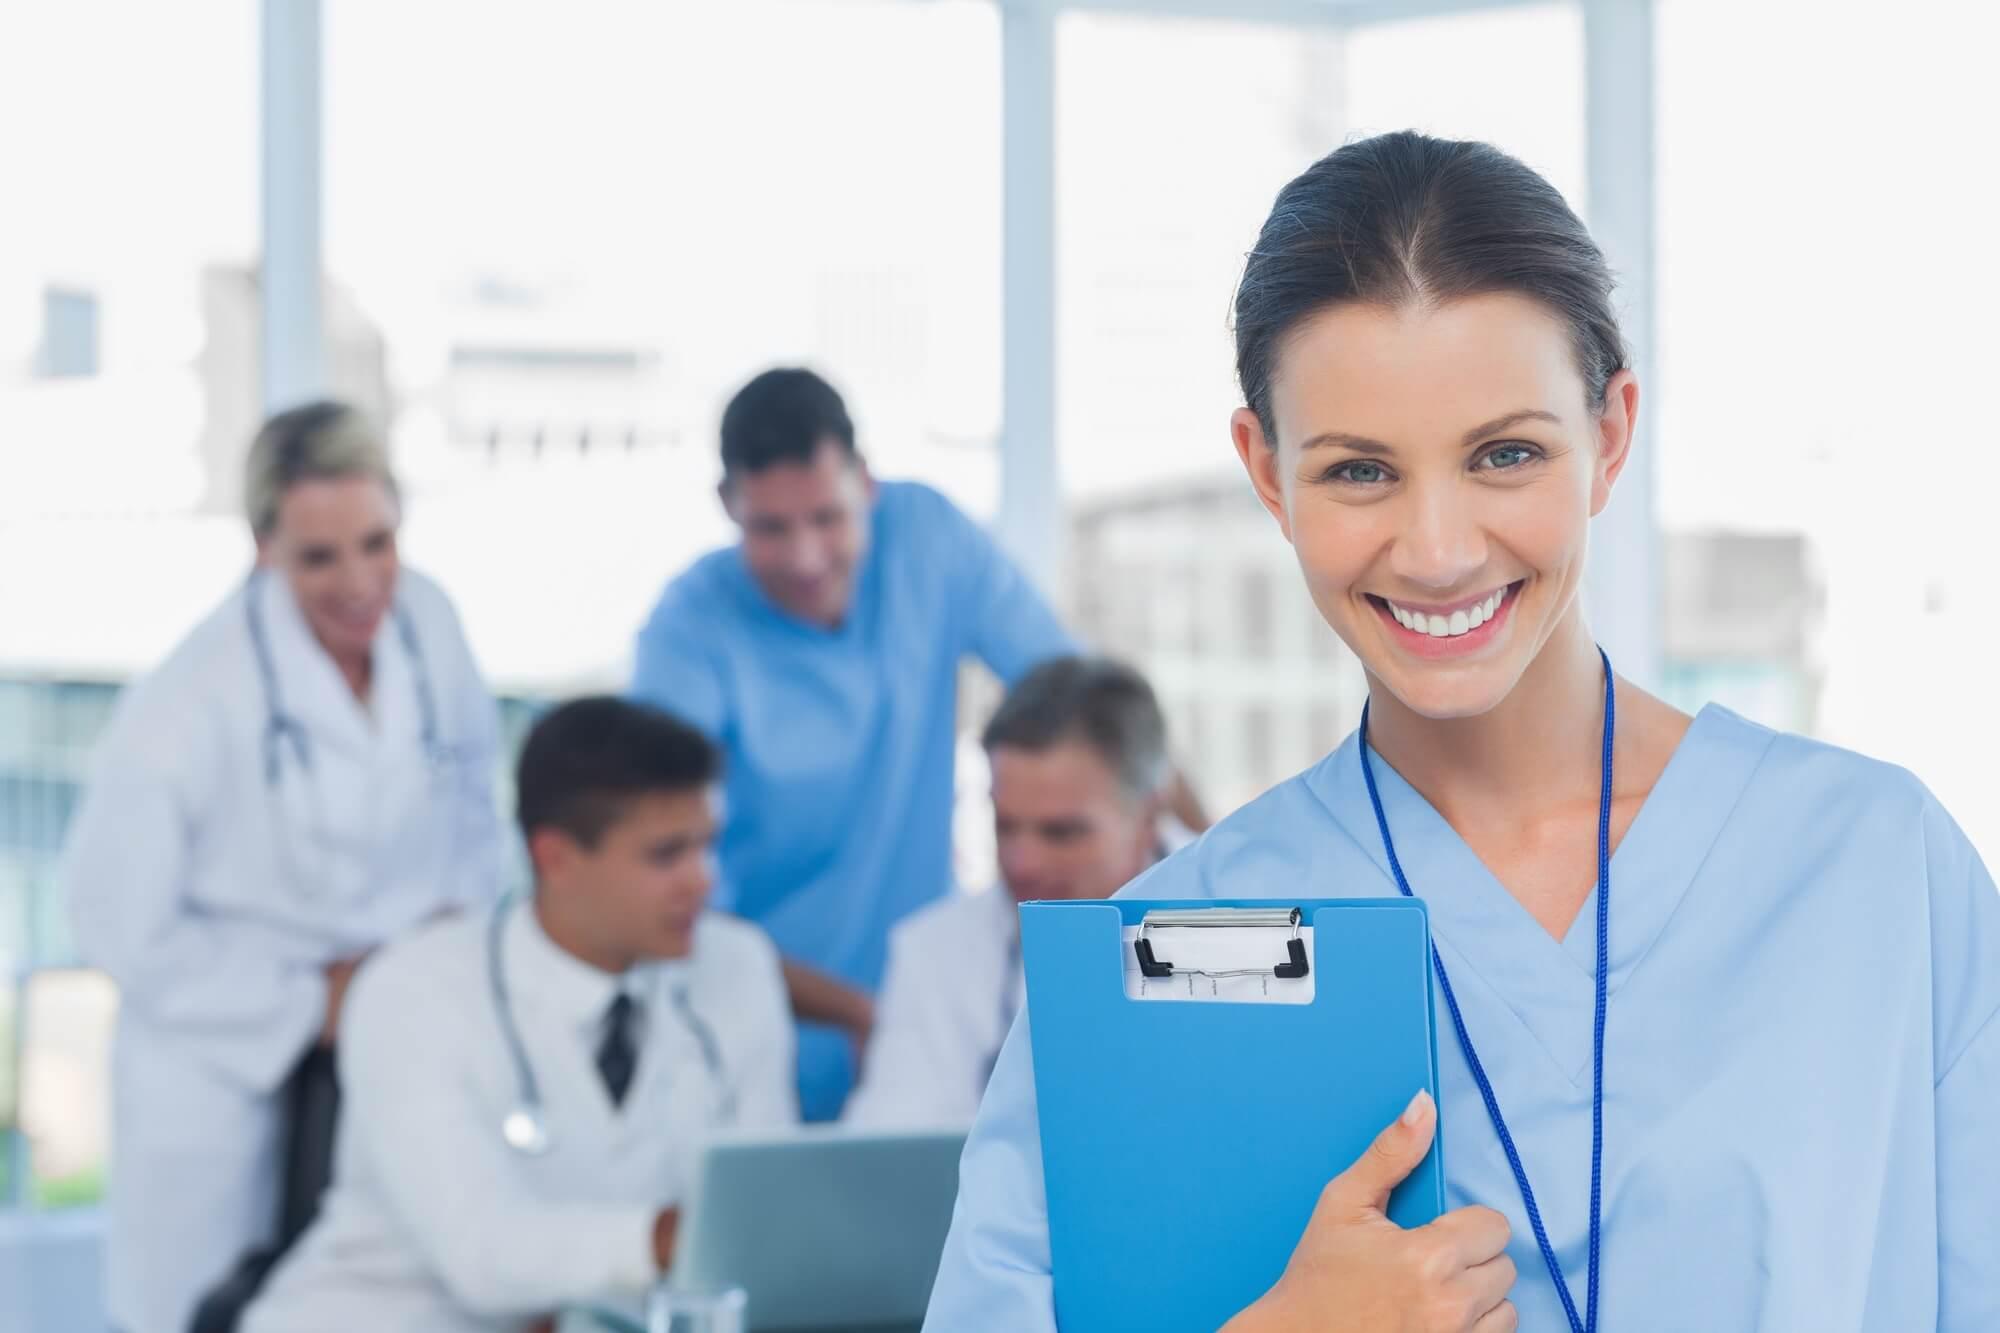 Benefits of EHR